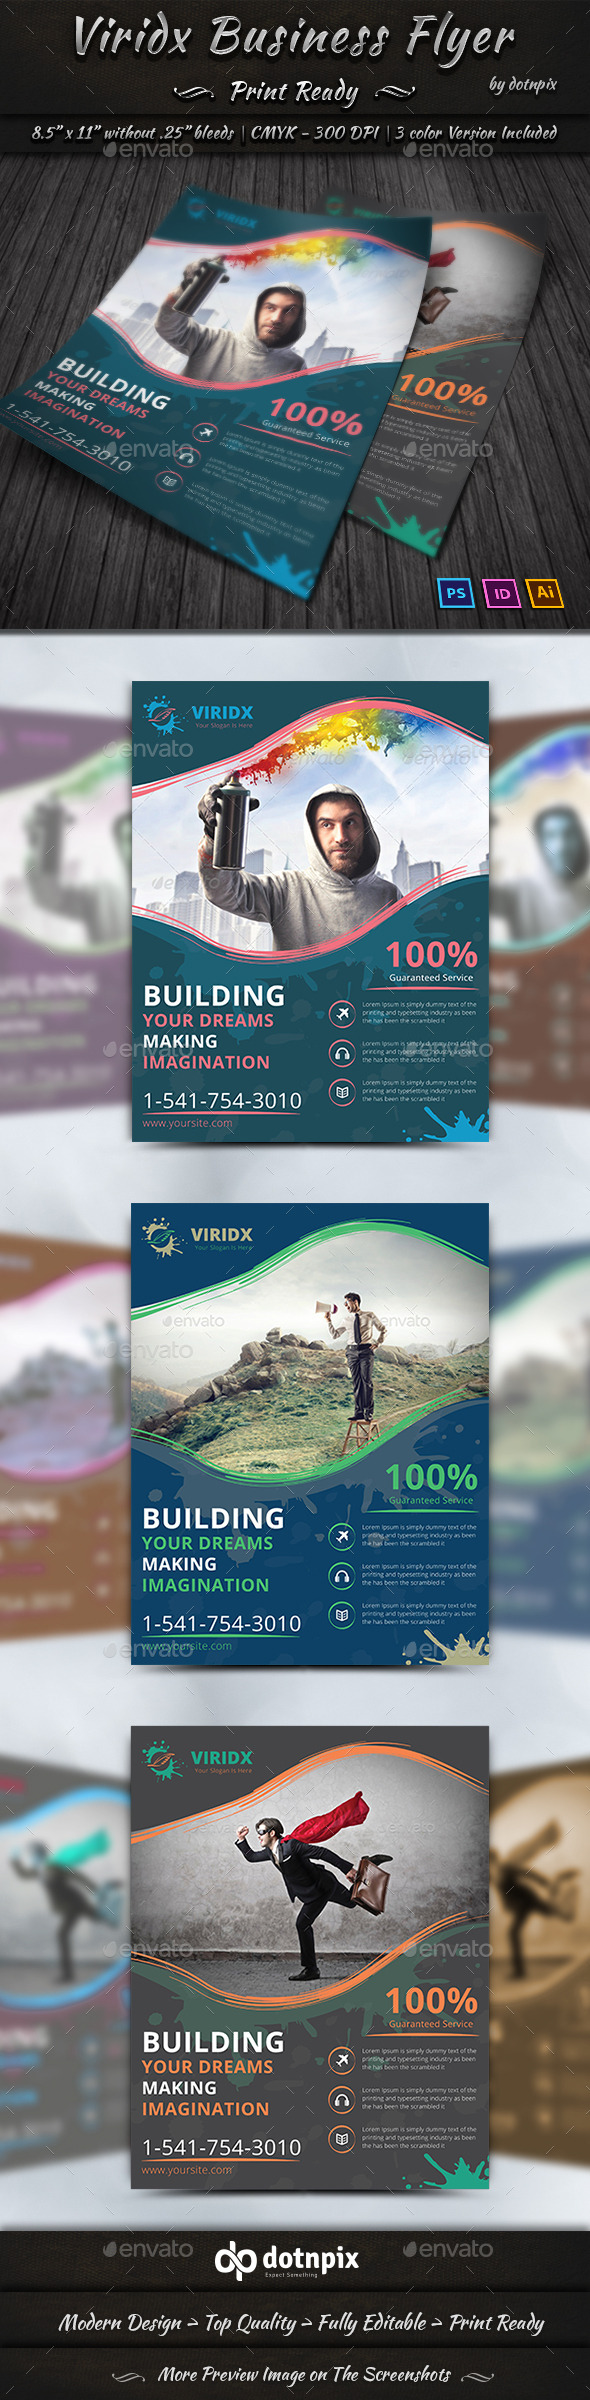 Viridx Business Flyer - Corporate Flyers